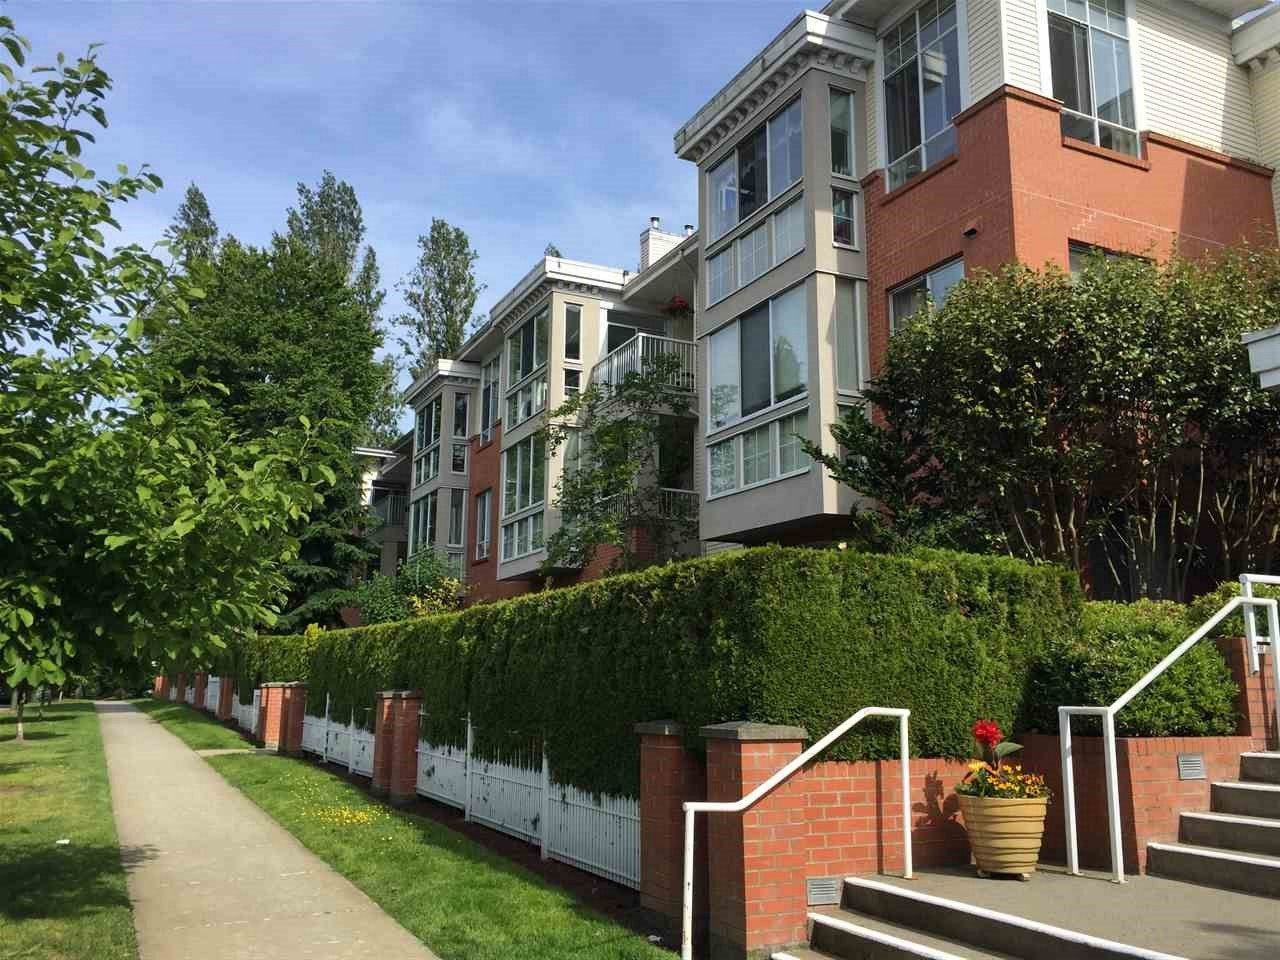 Main Photo: 403 360 E 36TH AVENUE in Vancouver: Main Condo for sale (Vancouver East)  : MLS®# R2177901